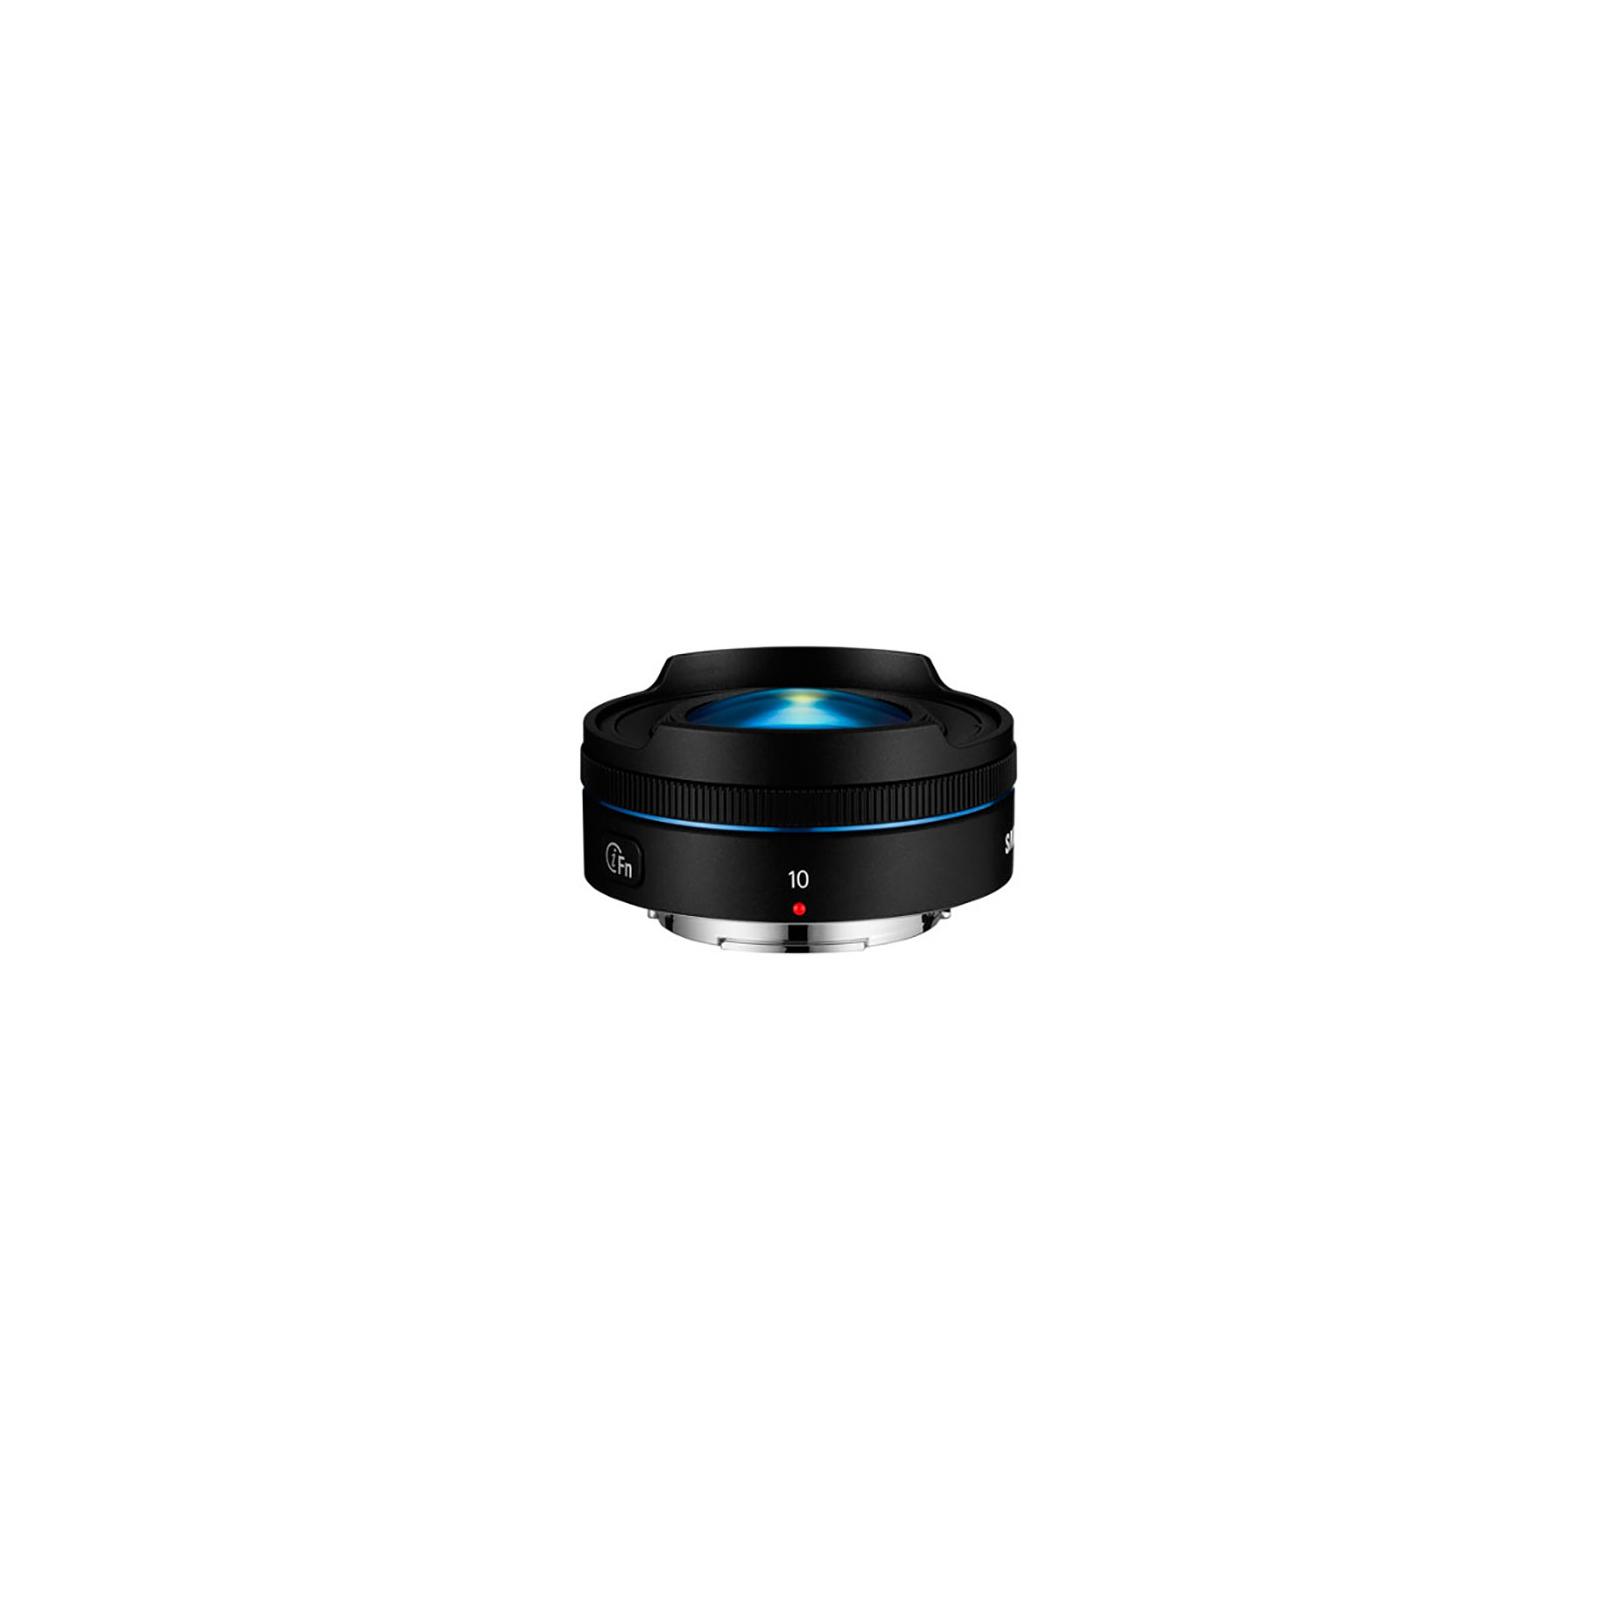 Объектив Samsung EX-F10ANW Fisheye Black (EX-F10ANB) изображение 2